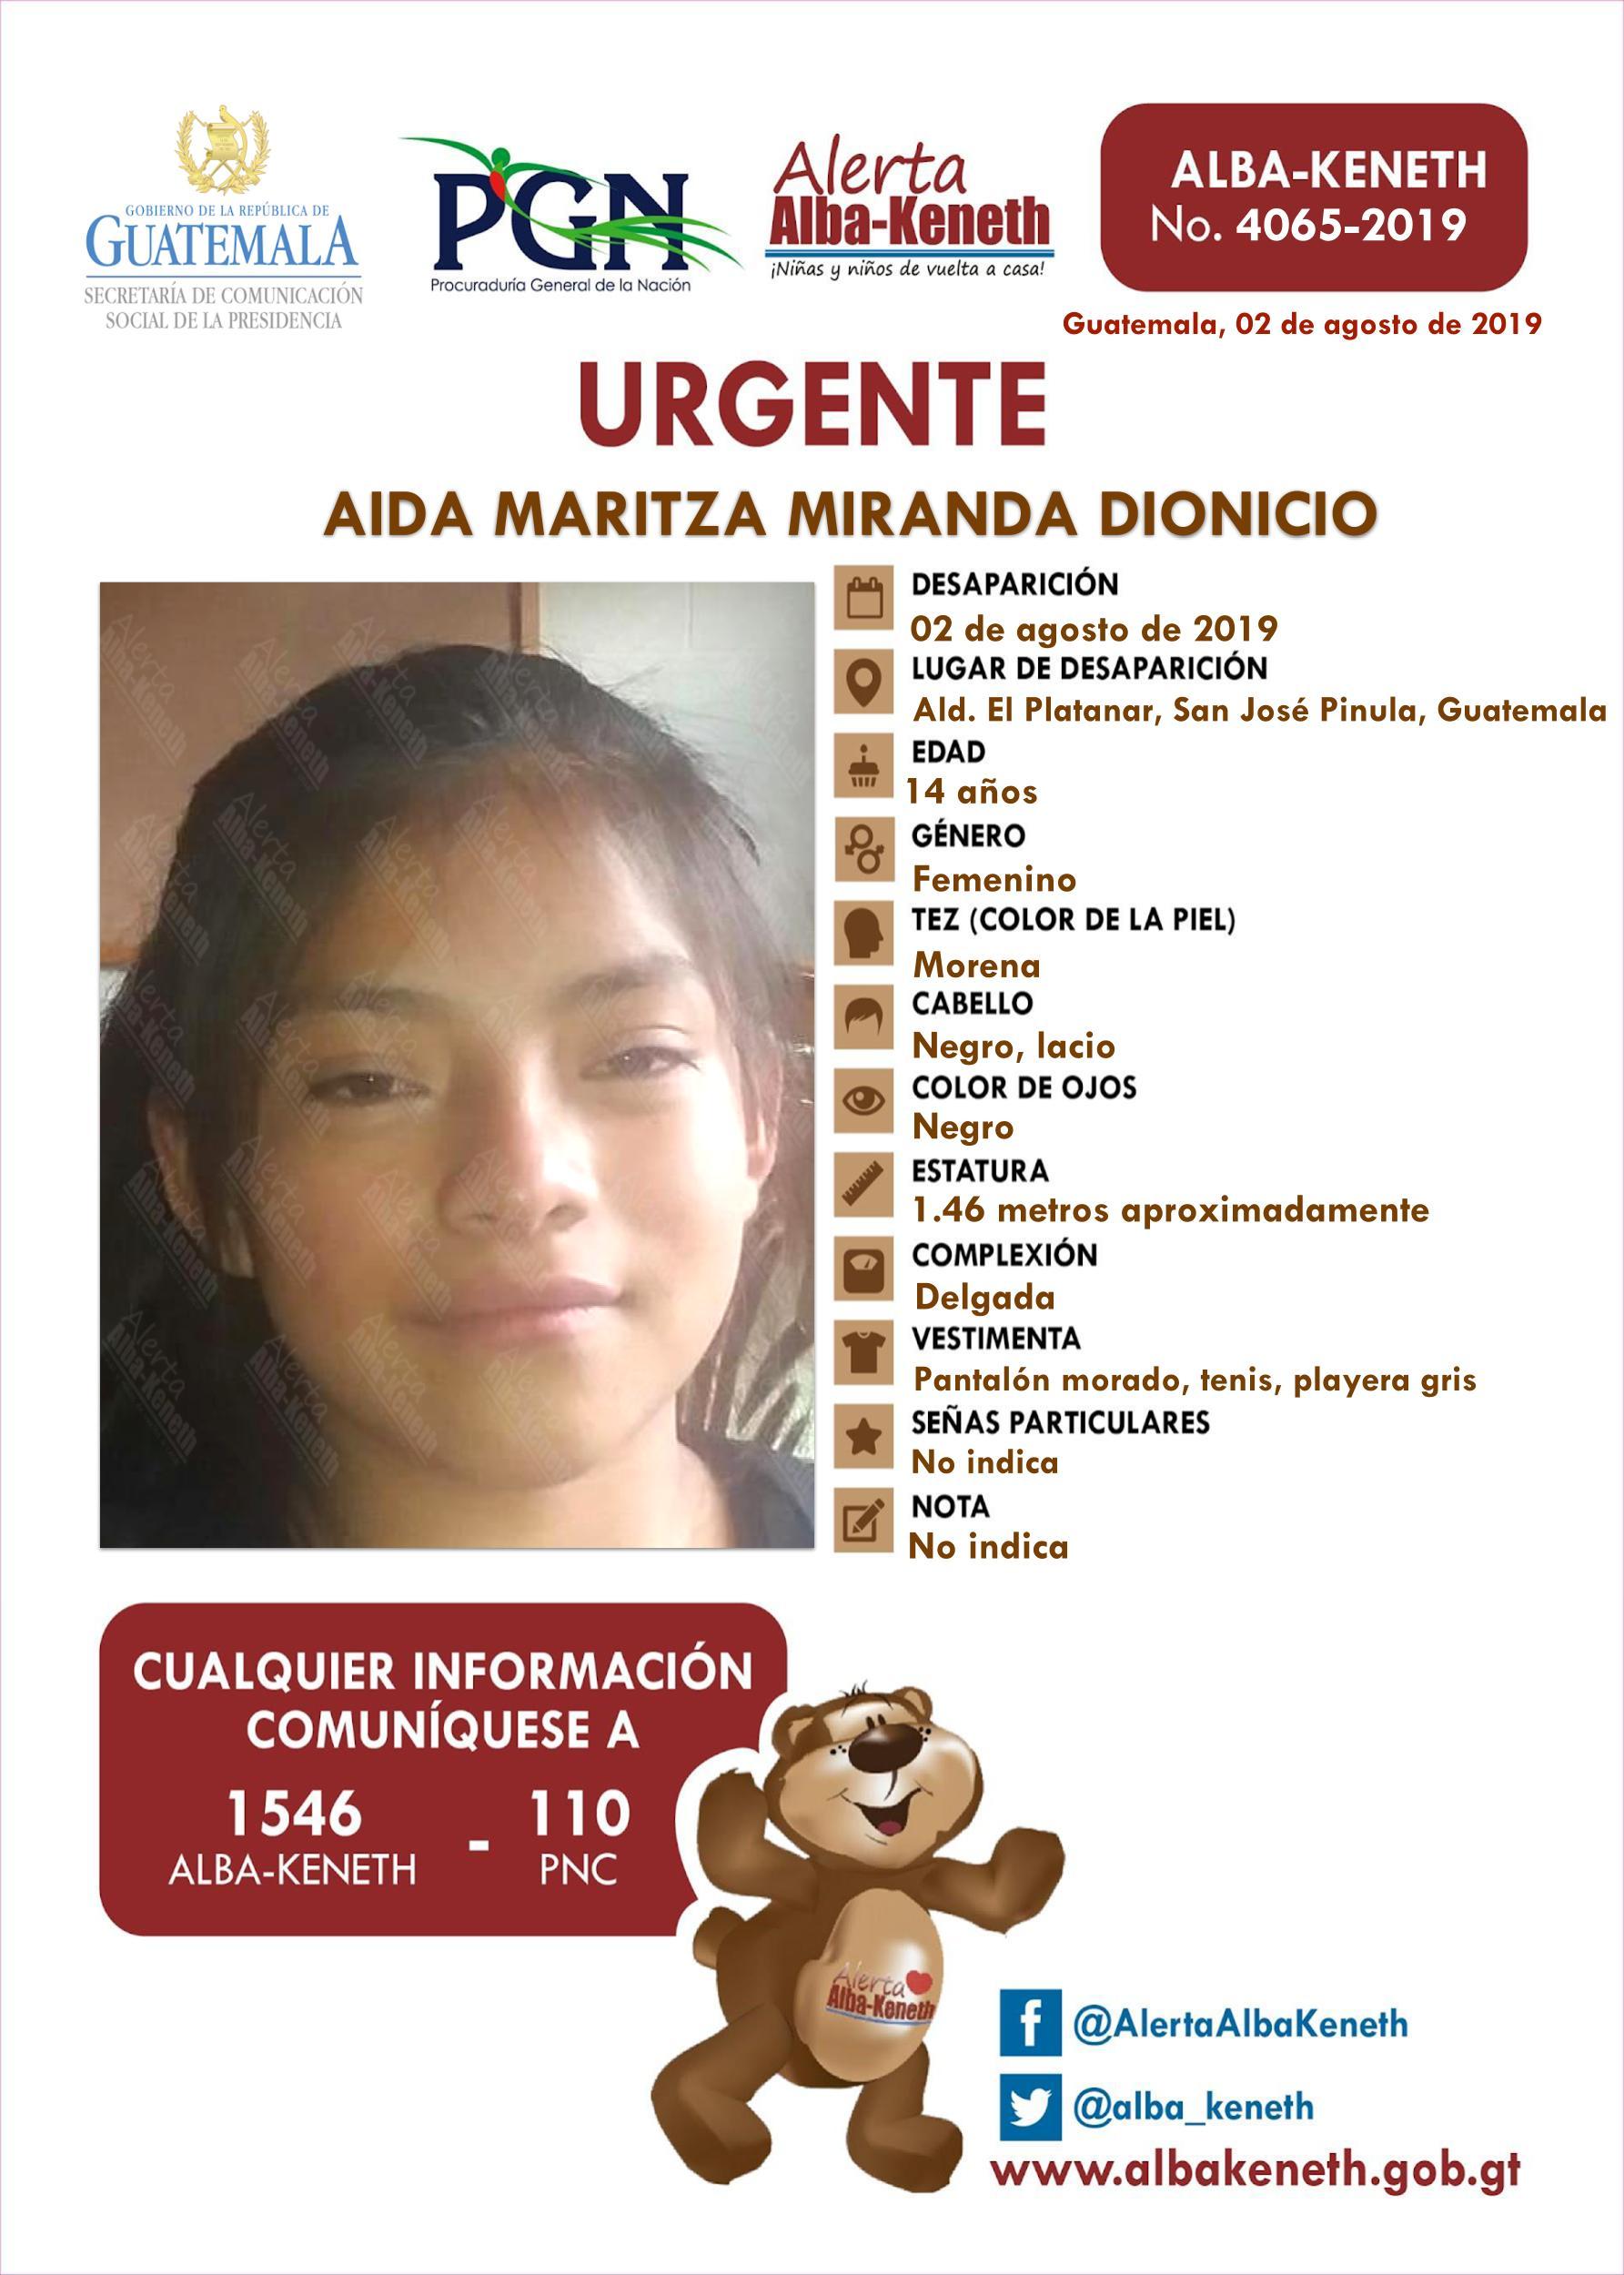 Aida Maritza Miranda Dionicio